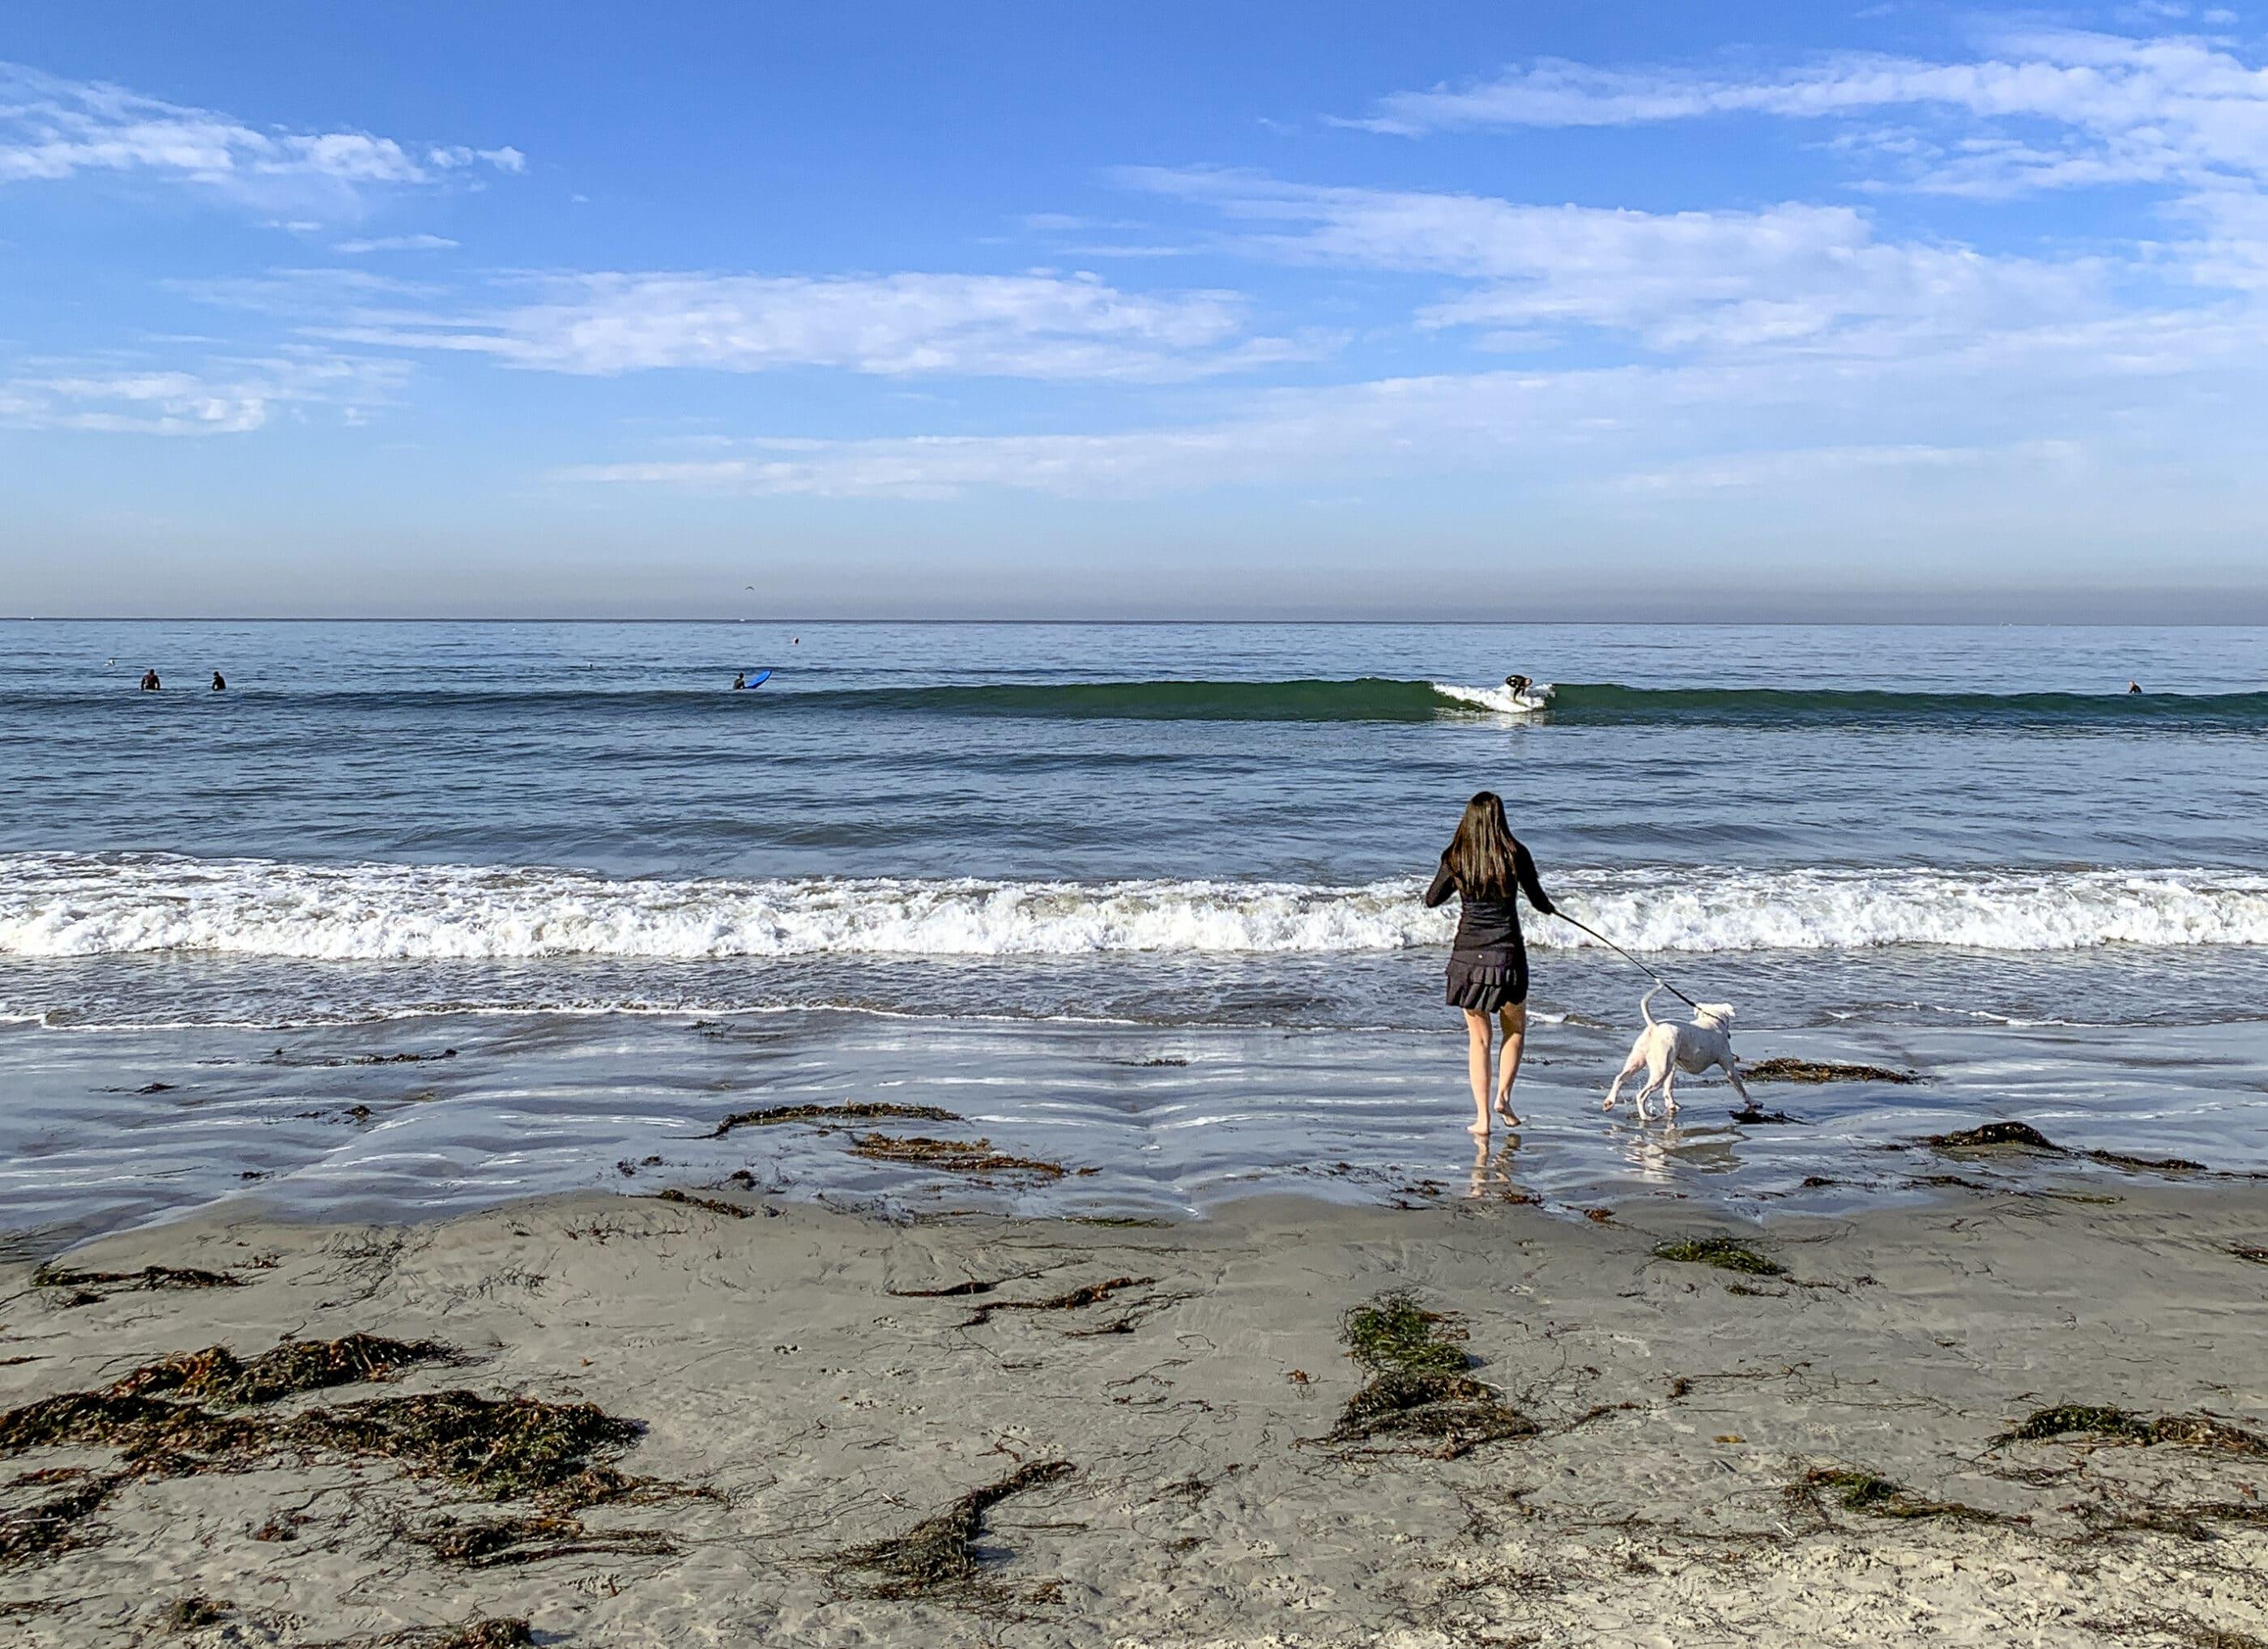 My dog runs on a leash toward the ocean at Law Street Beach in Pacific Beach.